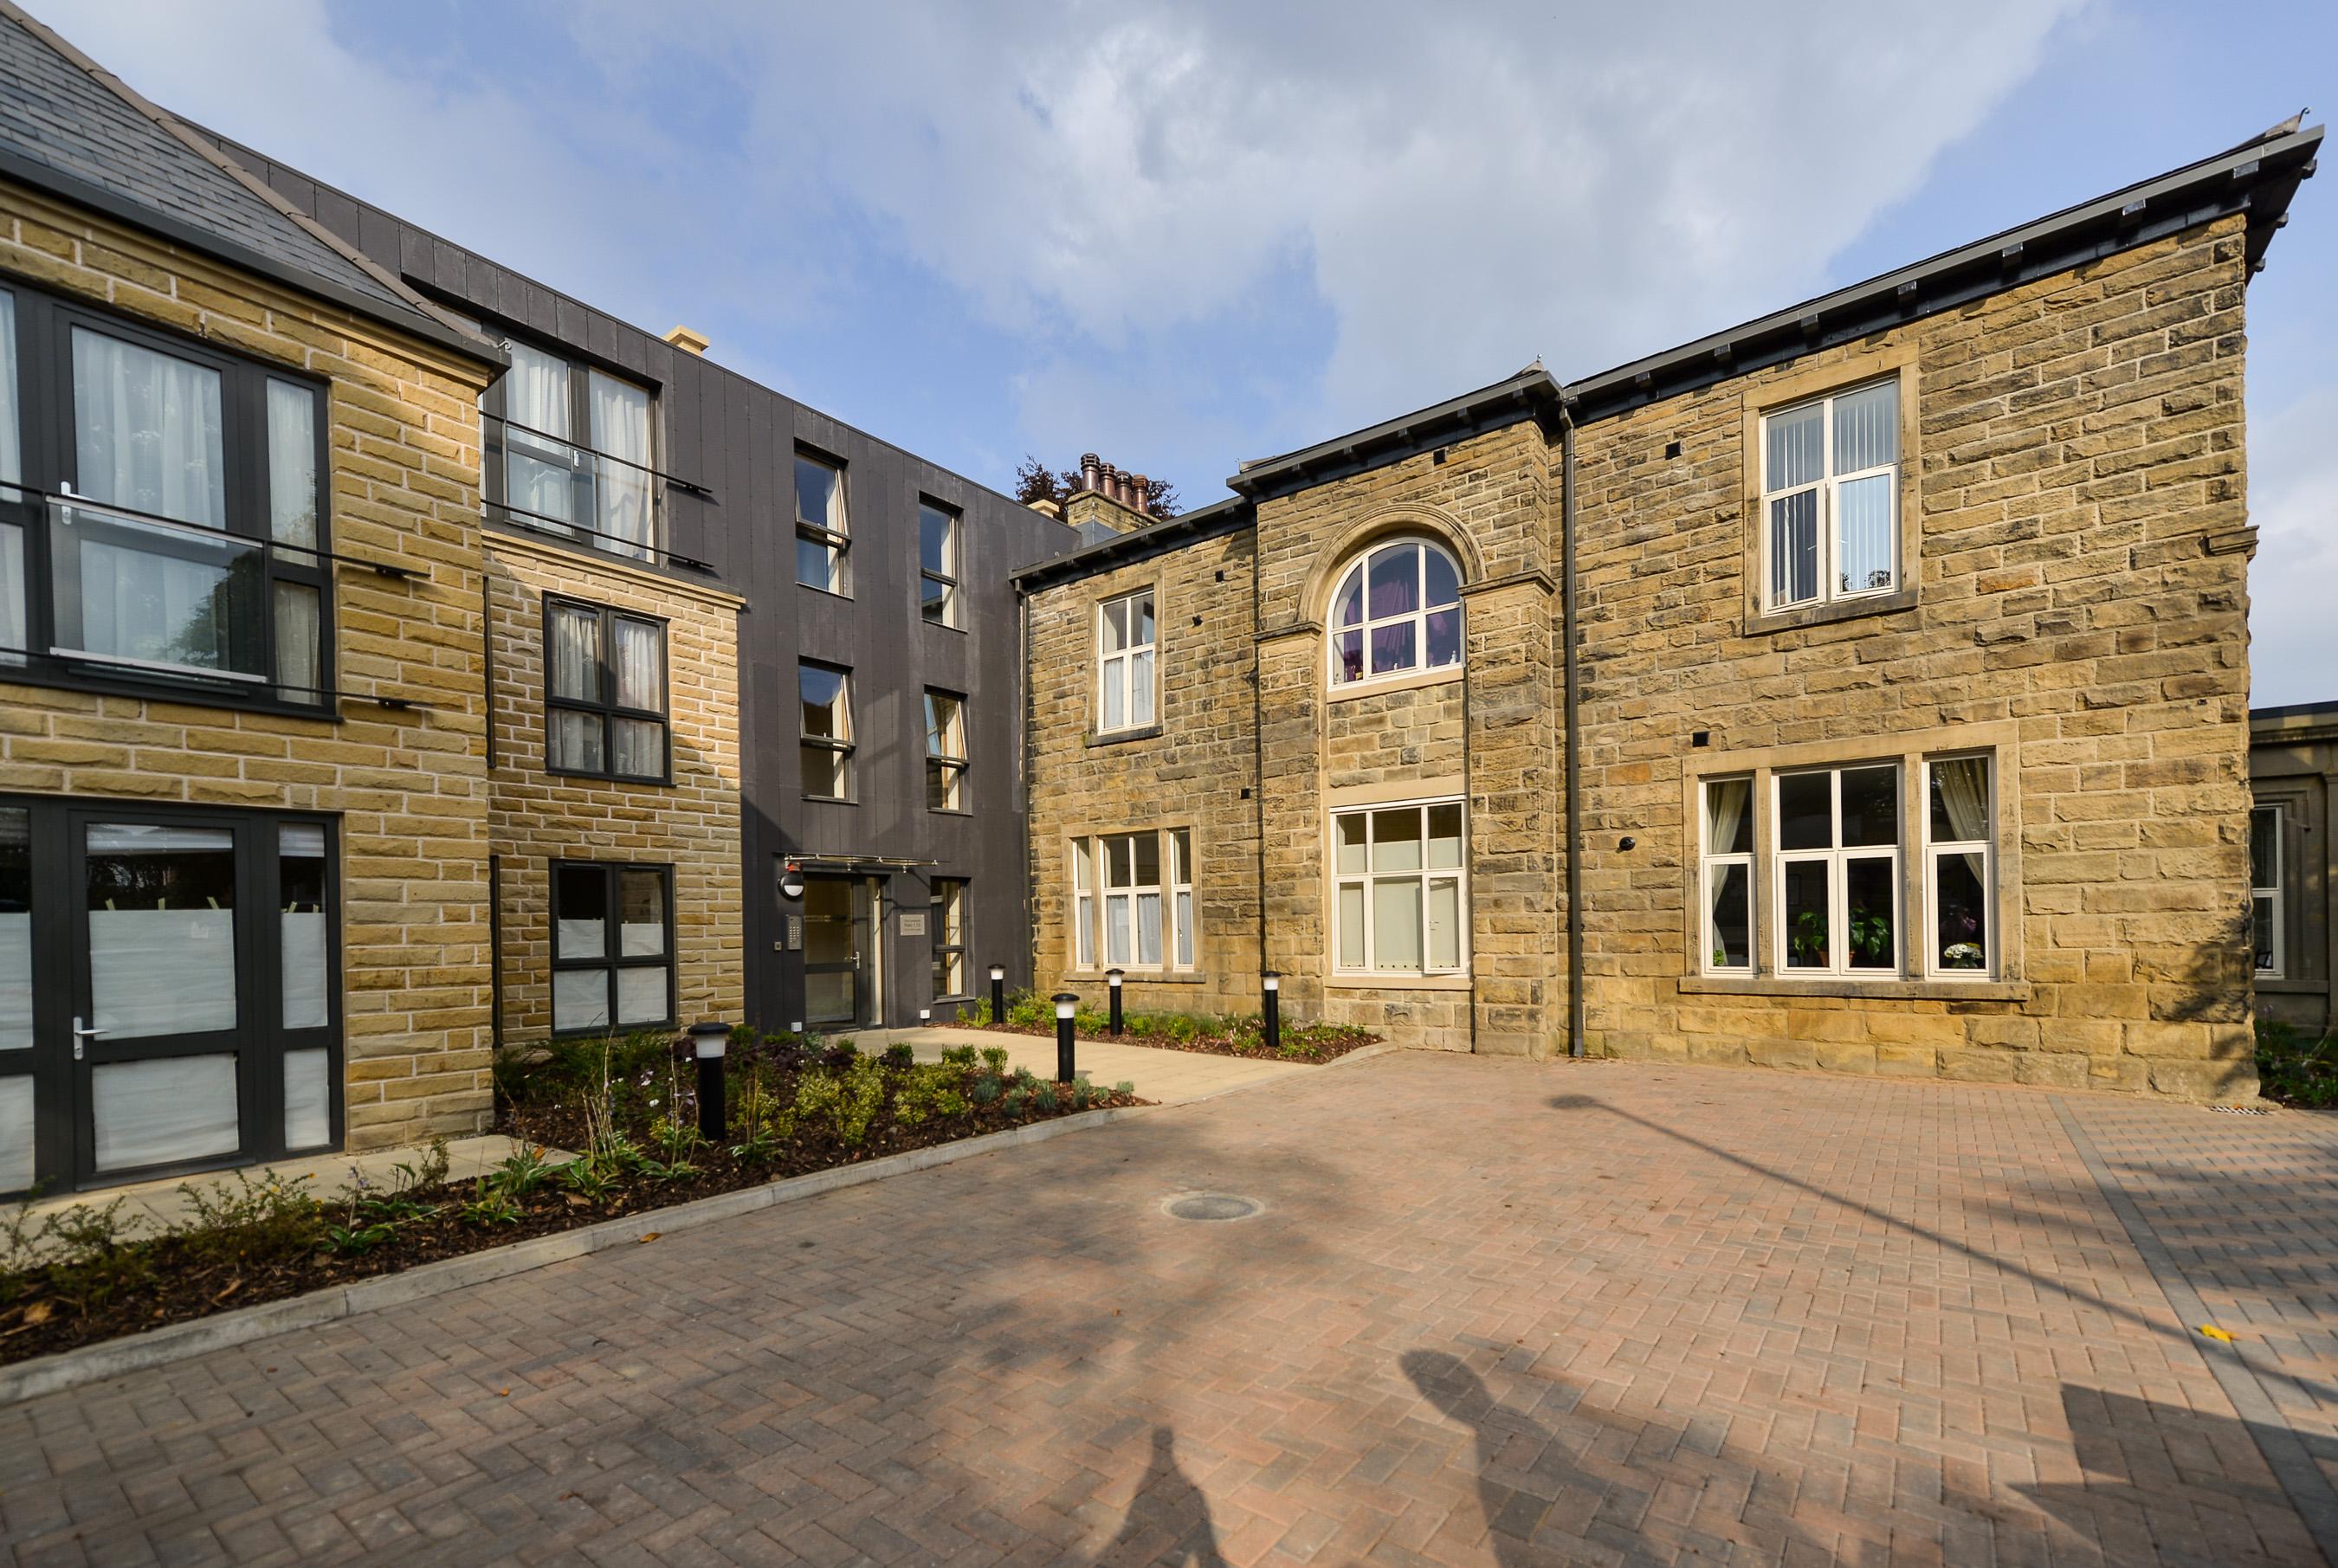 St Anne's Lane, Leeds, social housing, Adept engineers